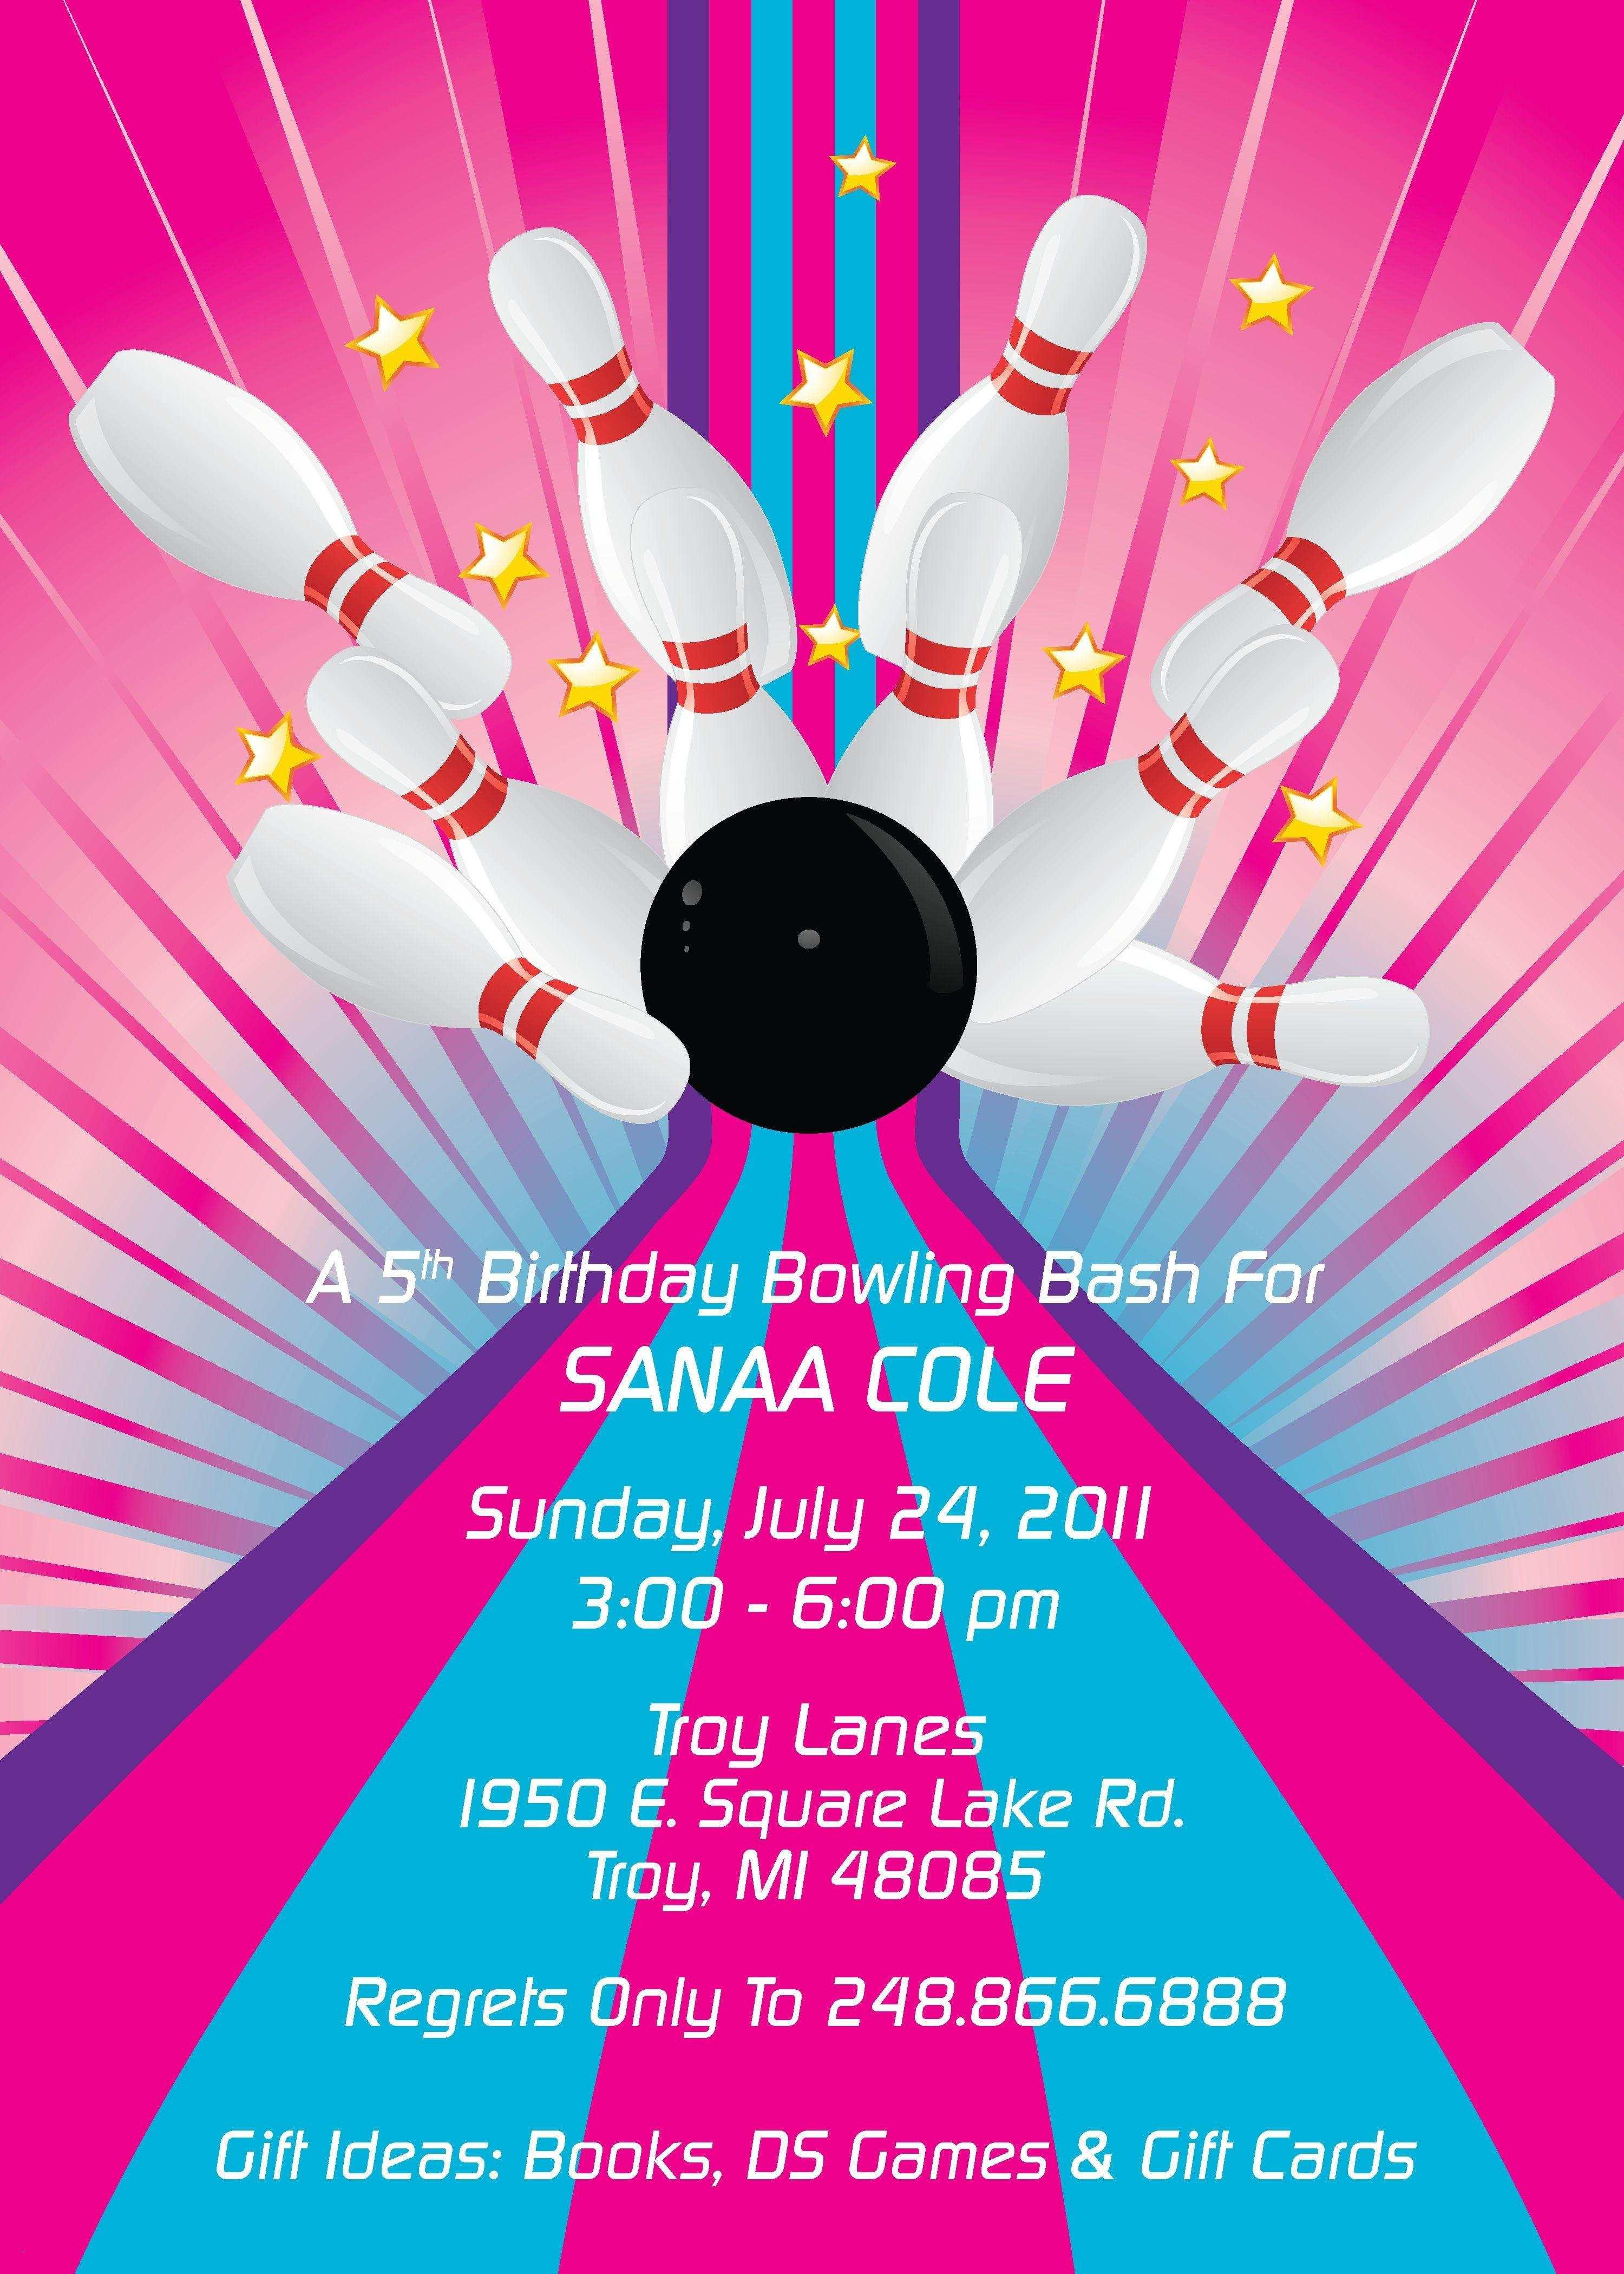 010 Template Ideas Bowling Birthday Party Invitation Free ~ Ulyssesroom - Free Printable Bowling Birthday Party Invitations